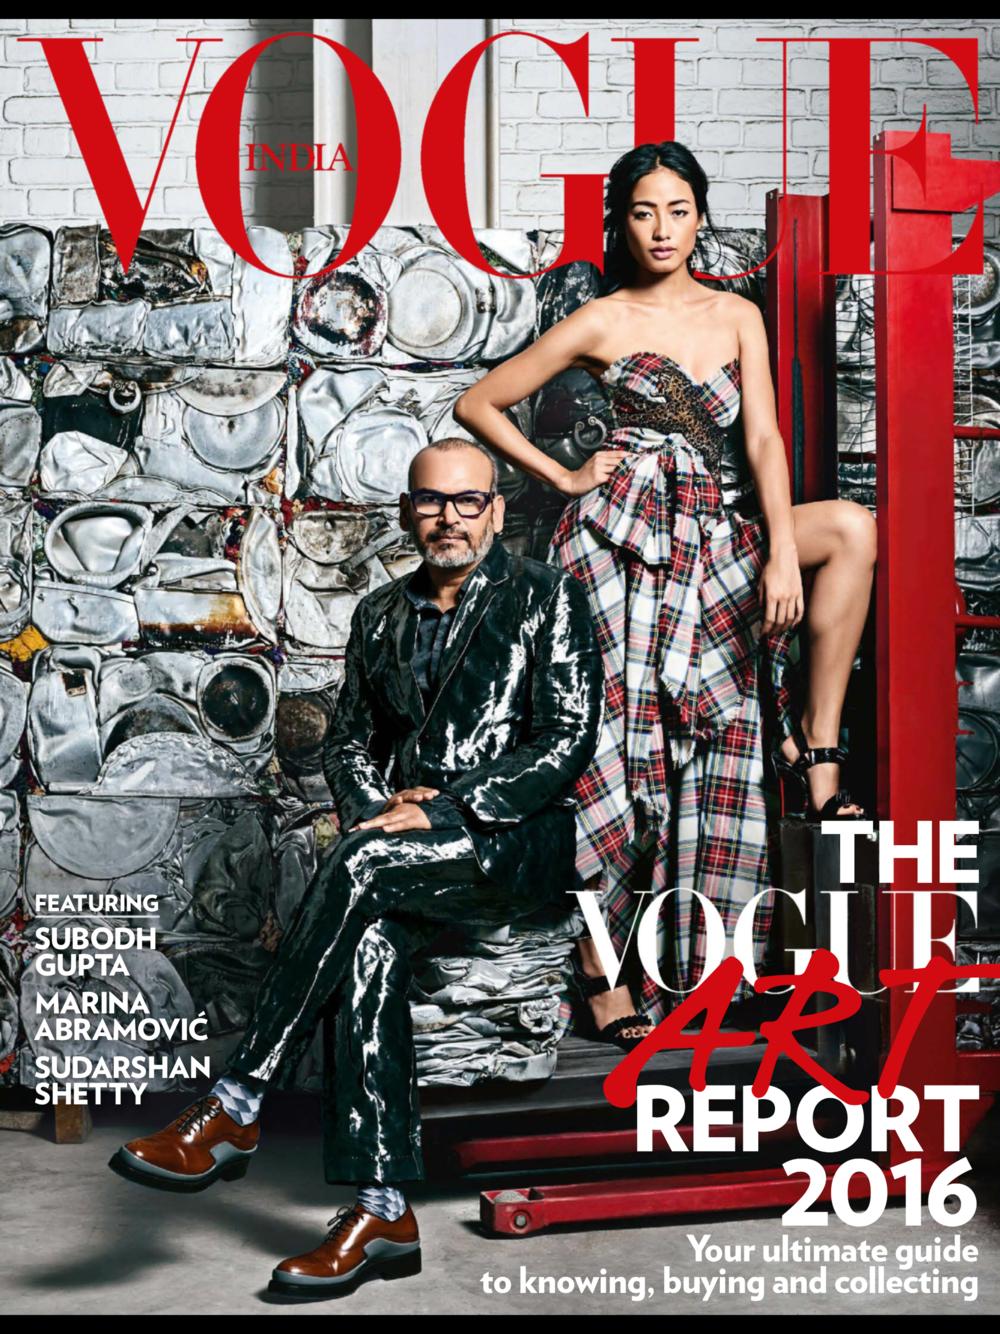 Based Upon_London_Art Design_Press_Vogue India